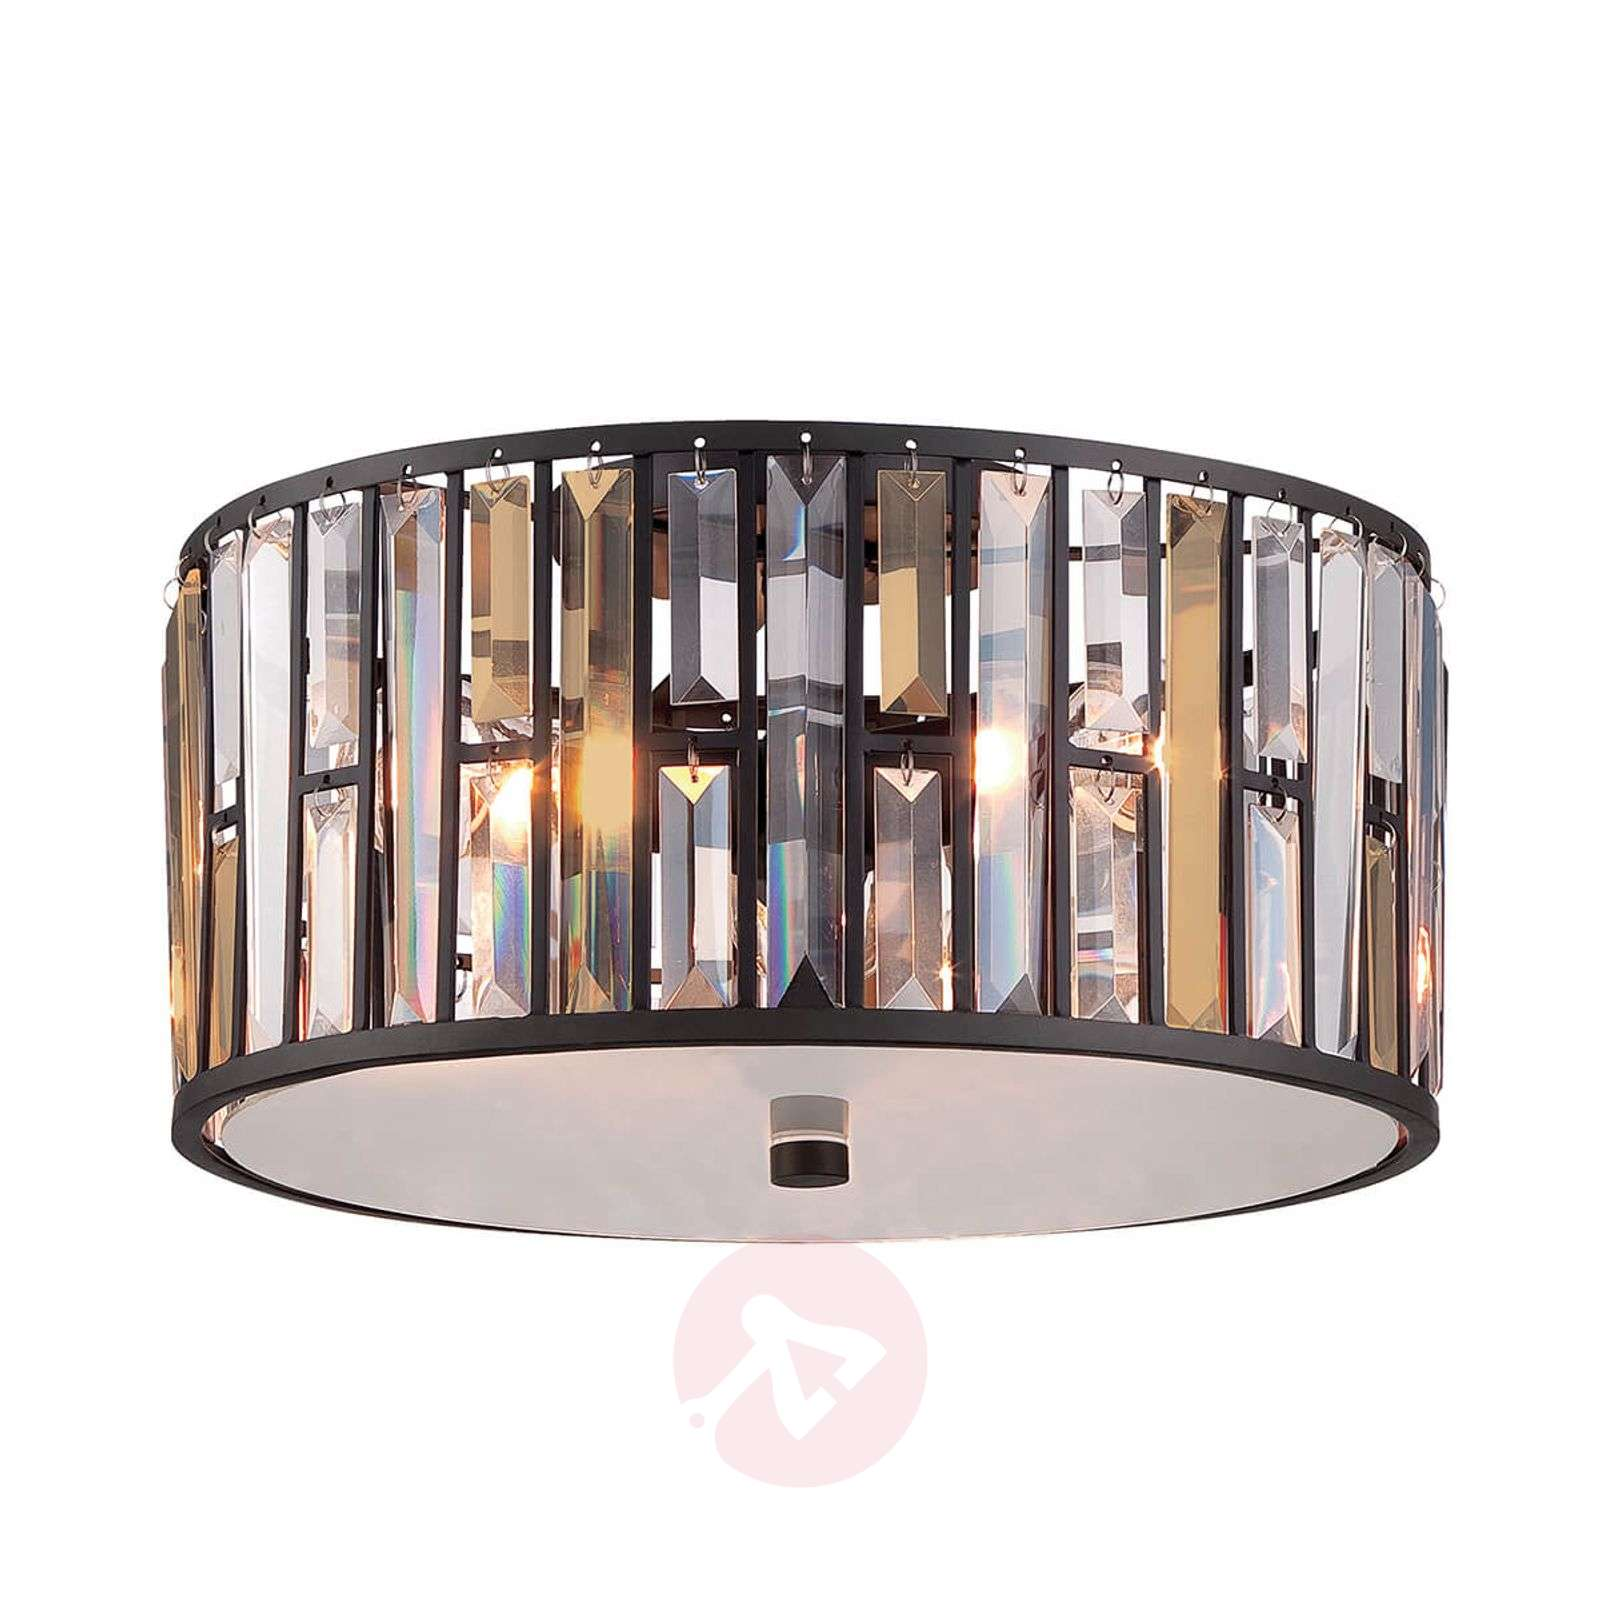 Fantastic crystal ceiling light Gemma-3048536-01